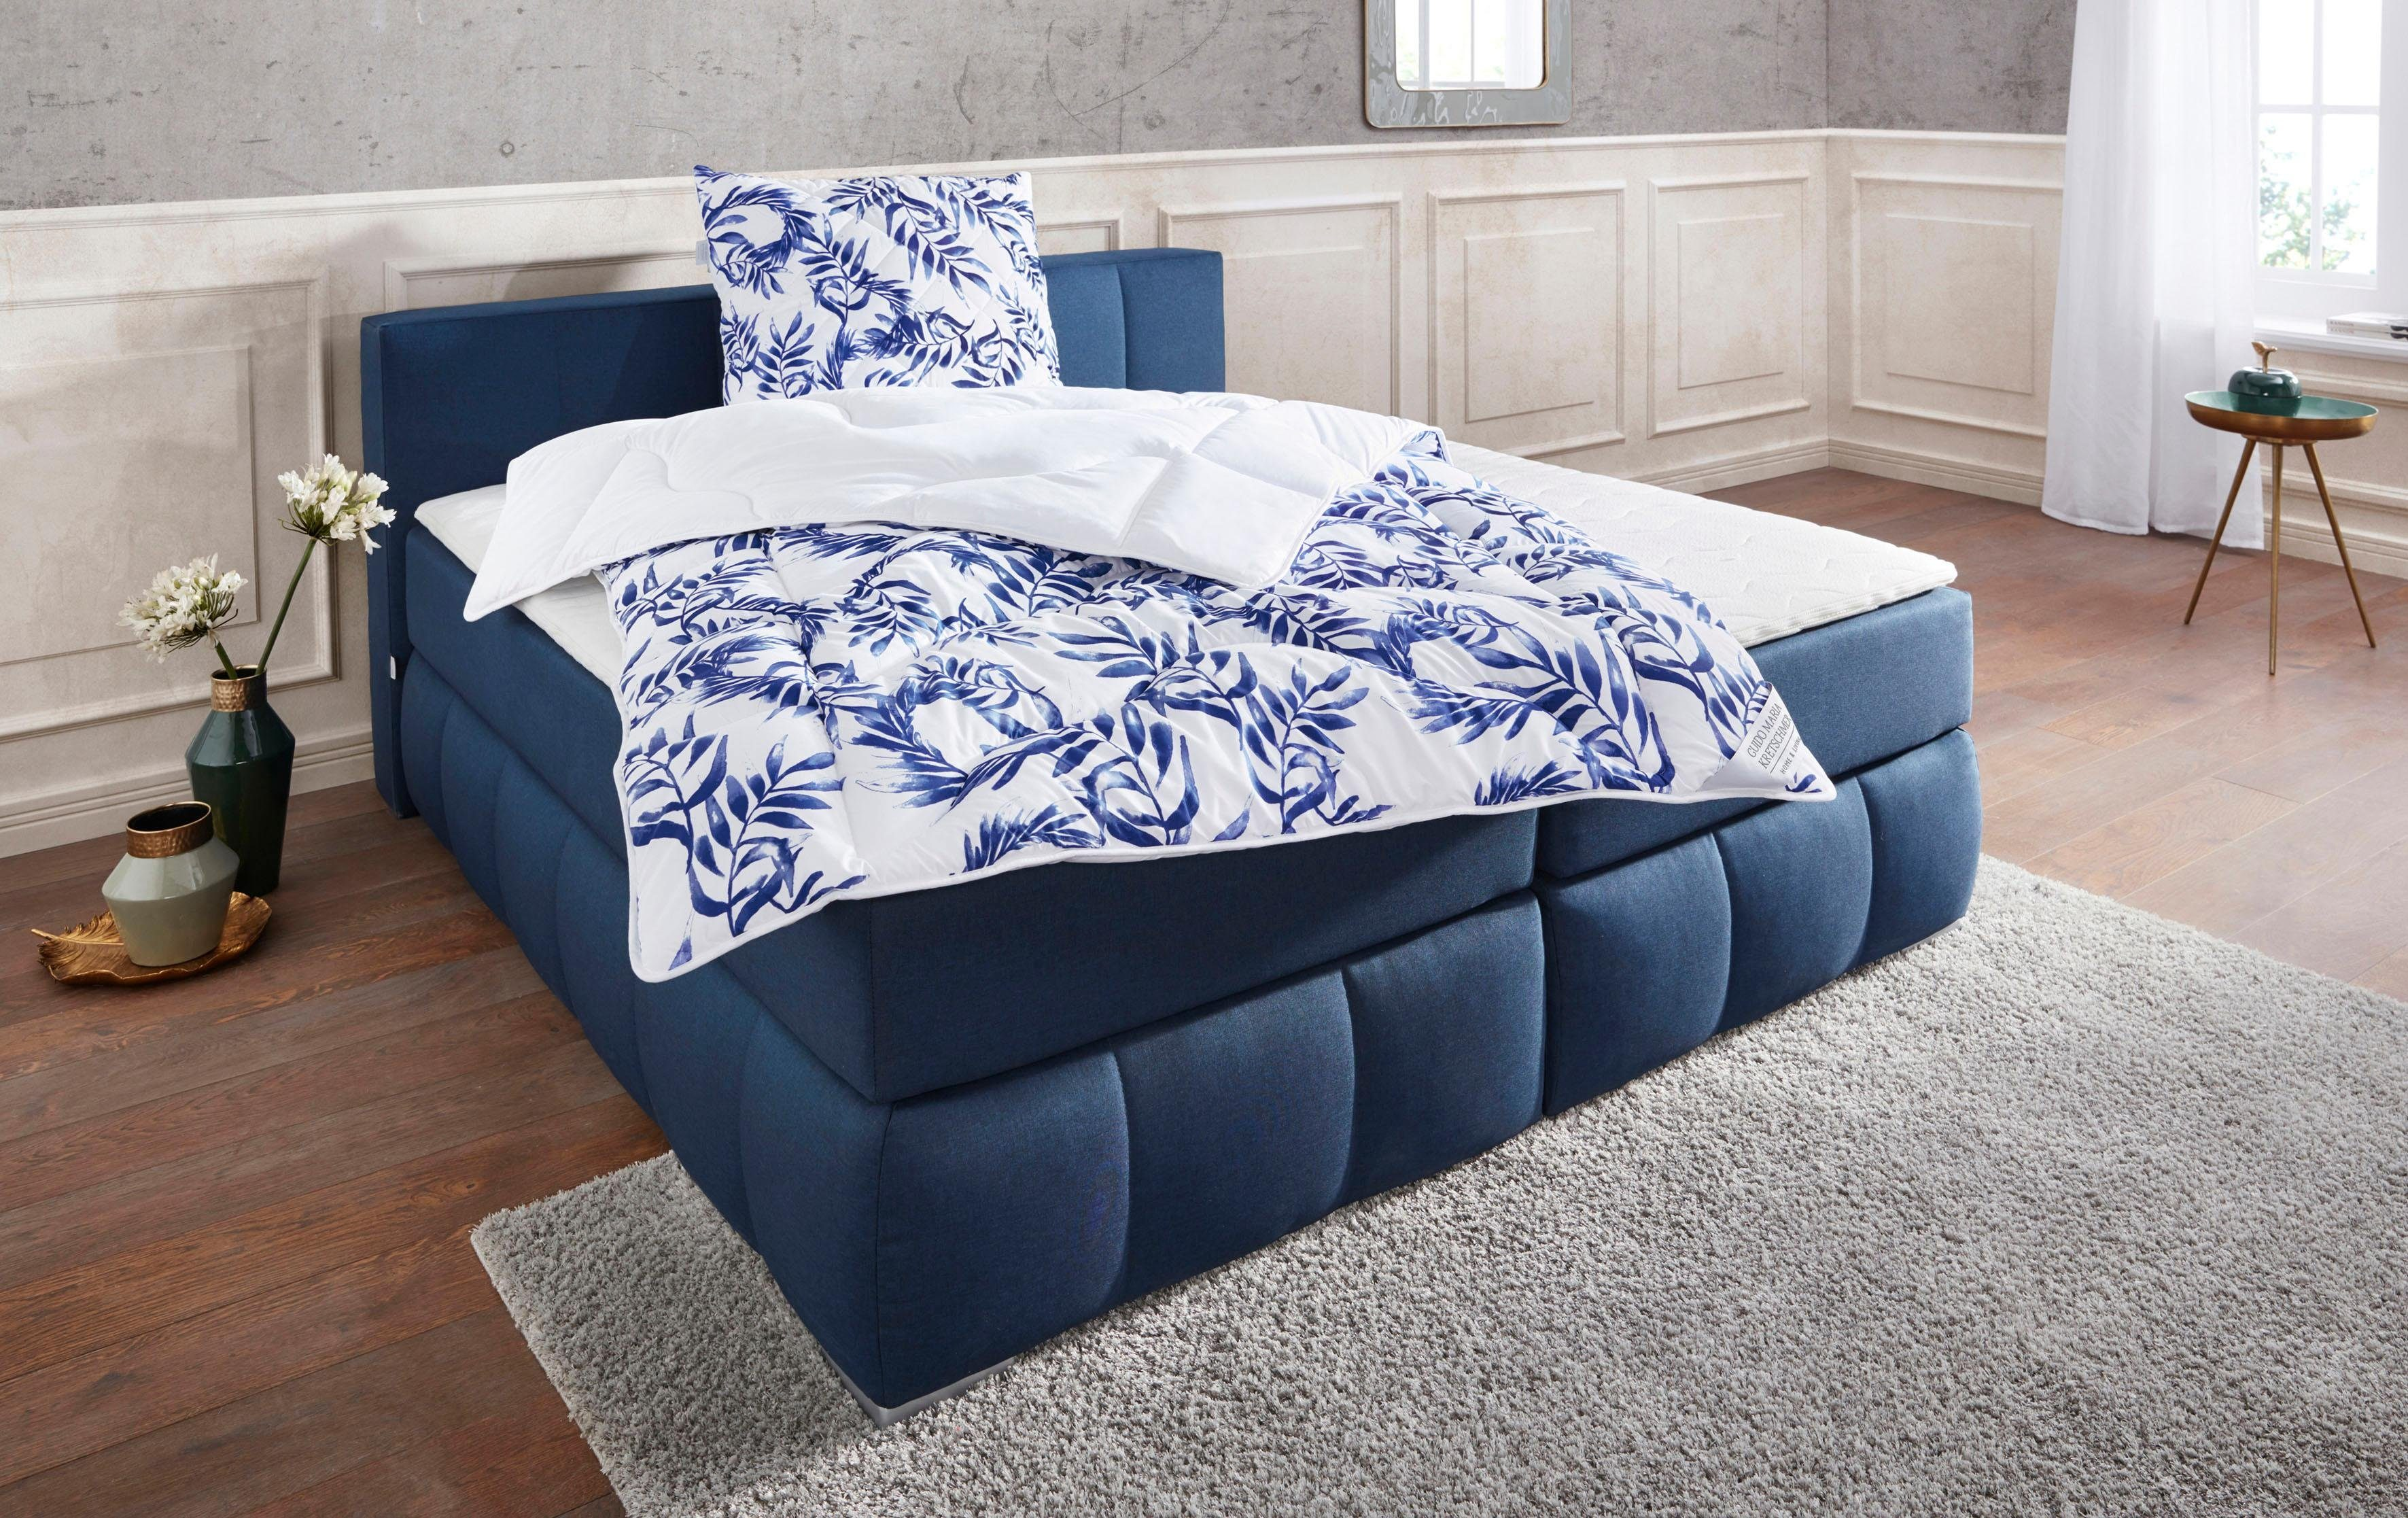 Bettdeckenset, »Blue leaves«, GMK Home & Living, Warm